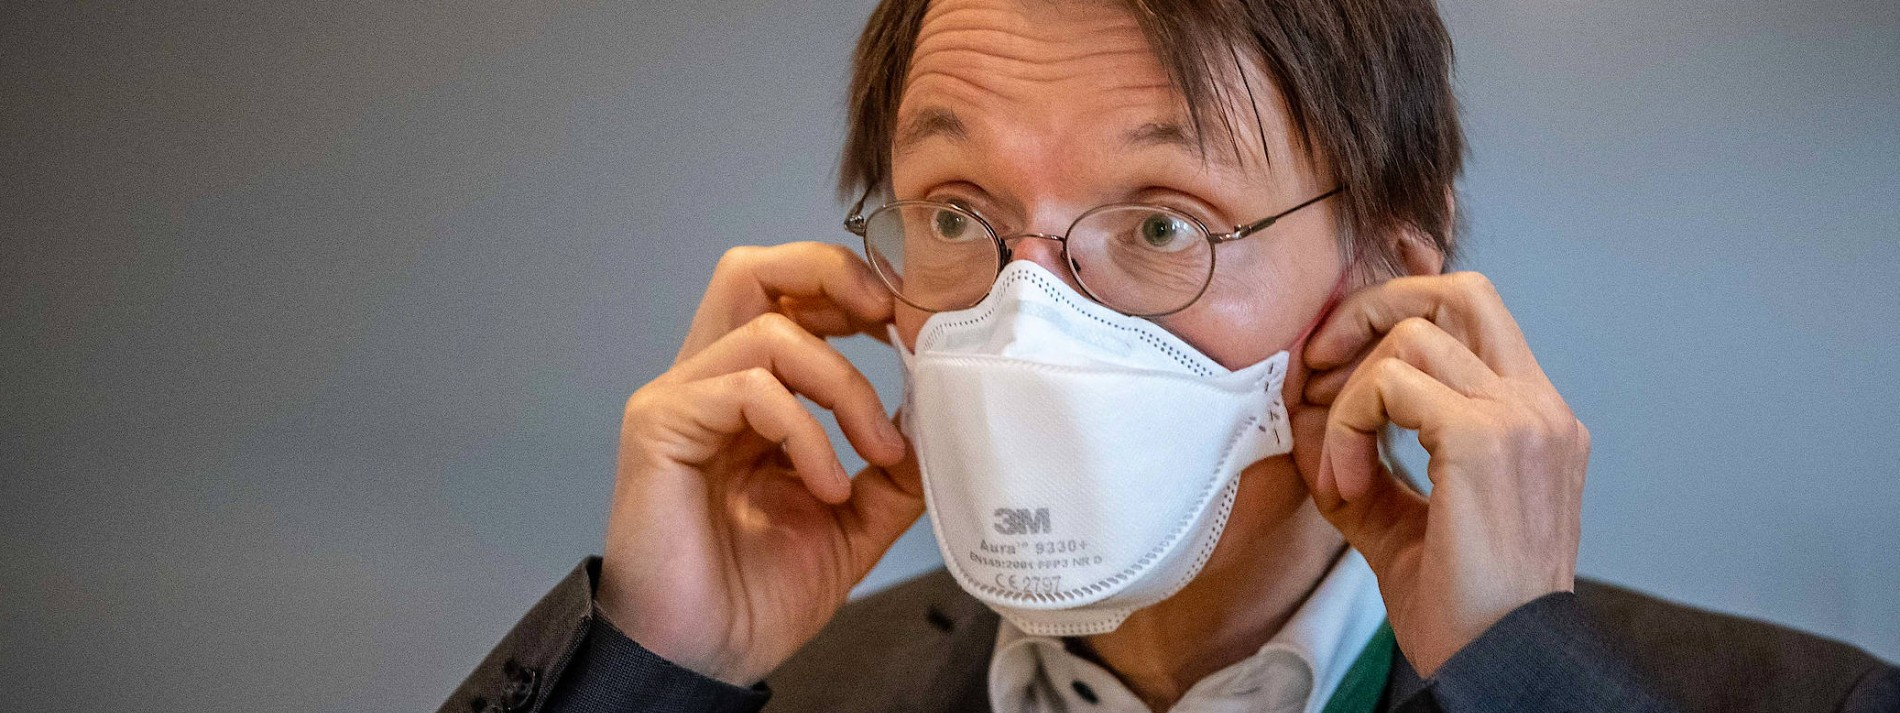 Lauterbach kritisiert Astra-Zeneca-Impfstopp